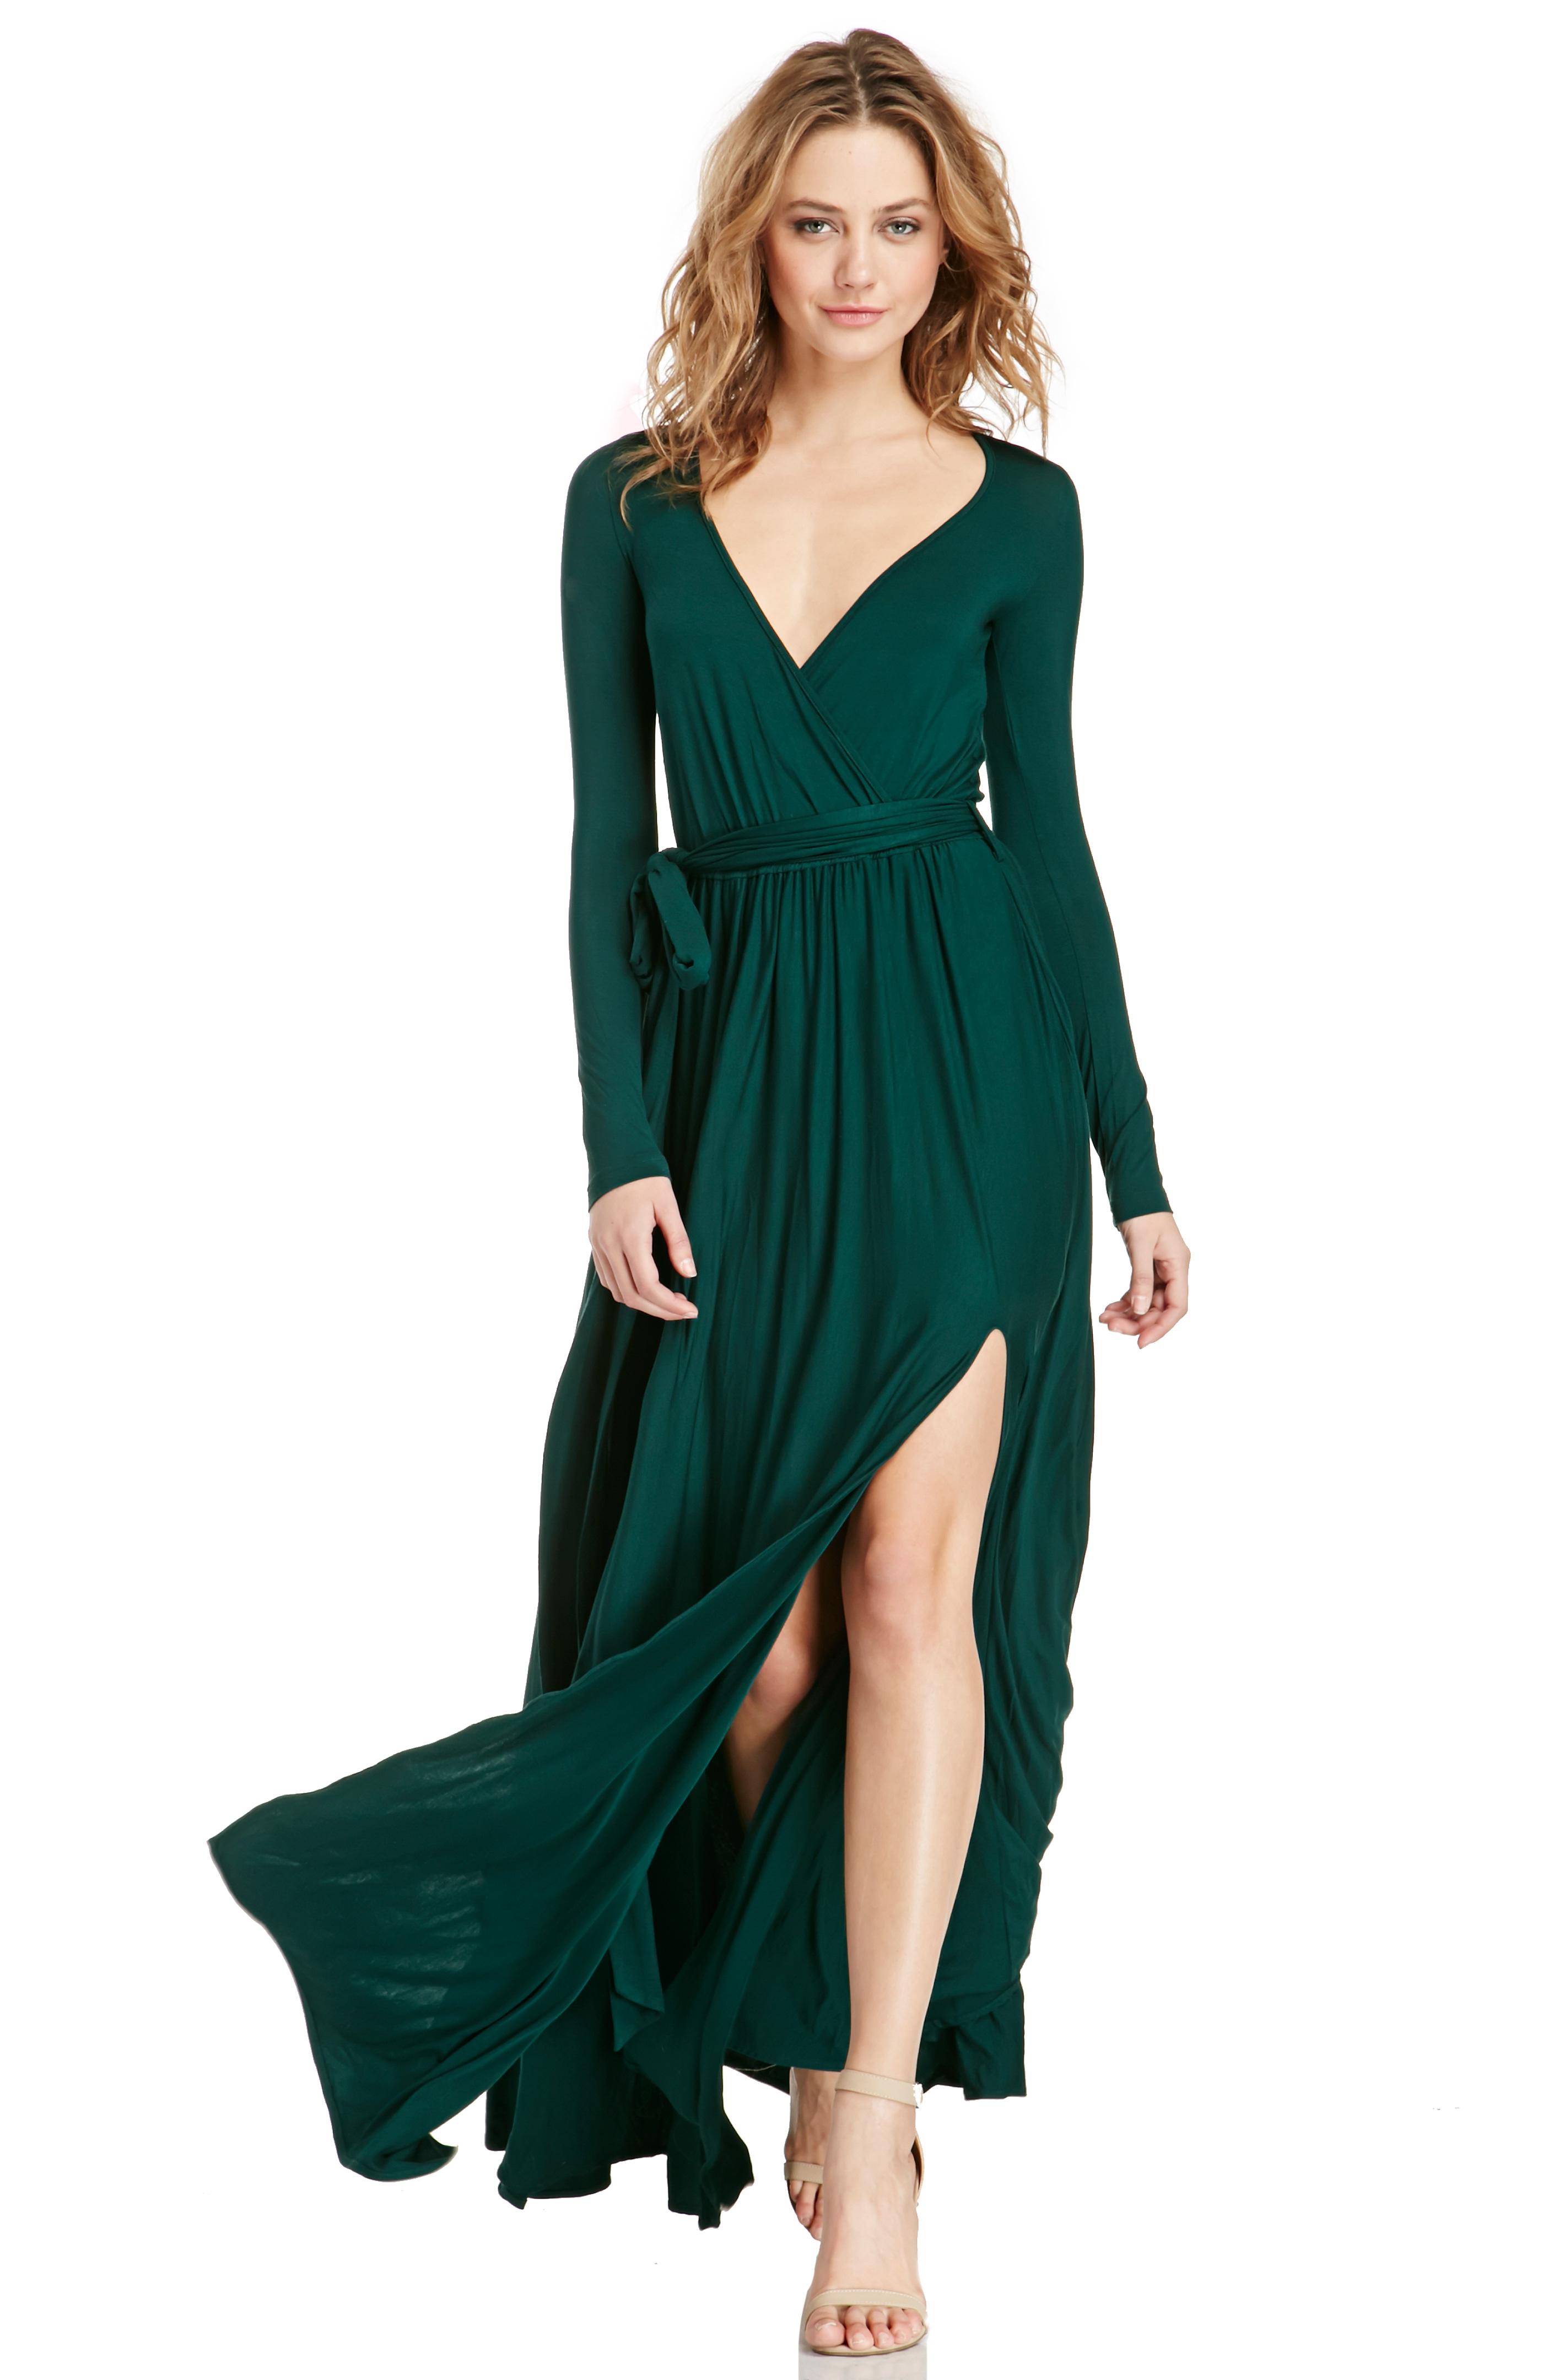 78d1cc6547dd Vivian Jersey Knit Wrap Maxi Dress in Emerald